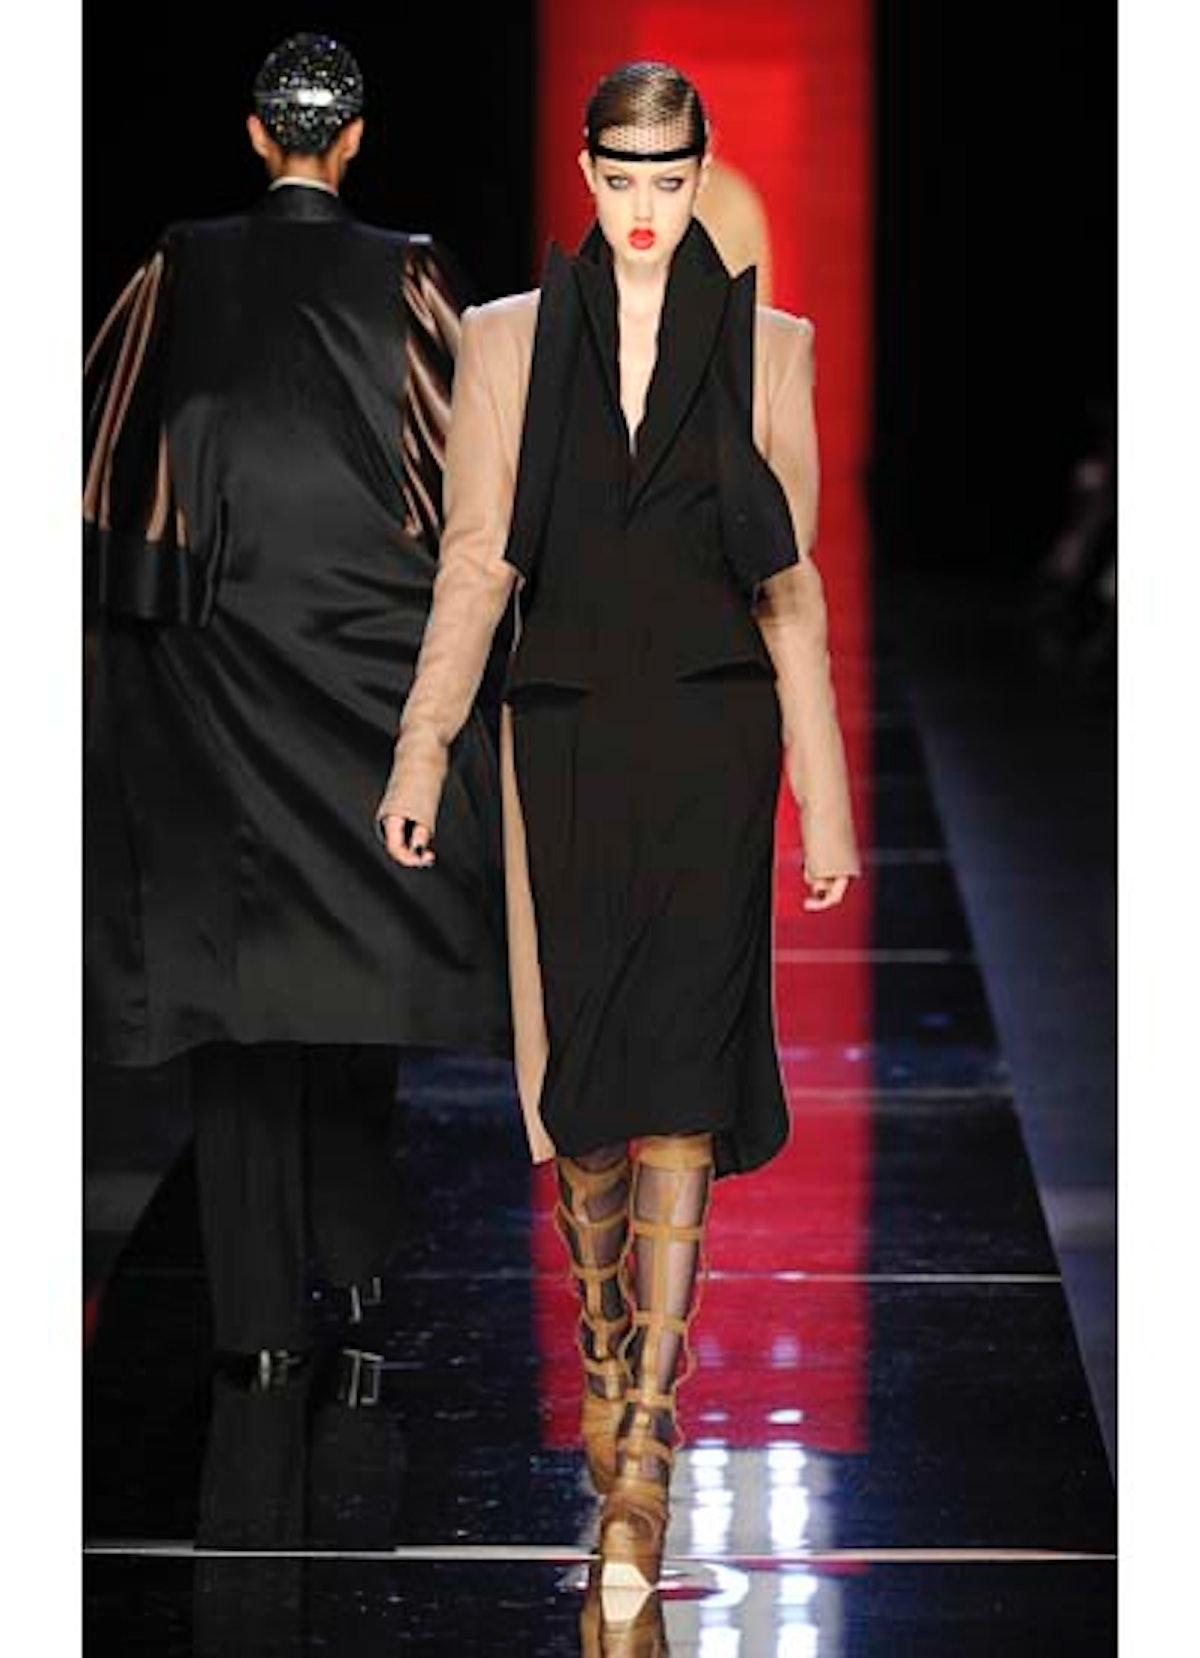 fass-jean-paul-gaultier-couture-2012-runway-18-v.jpg